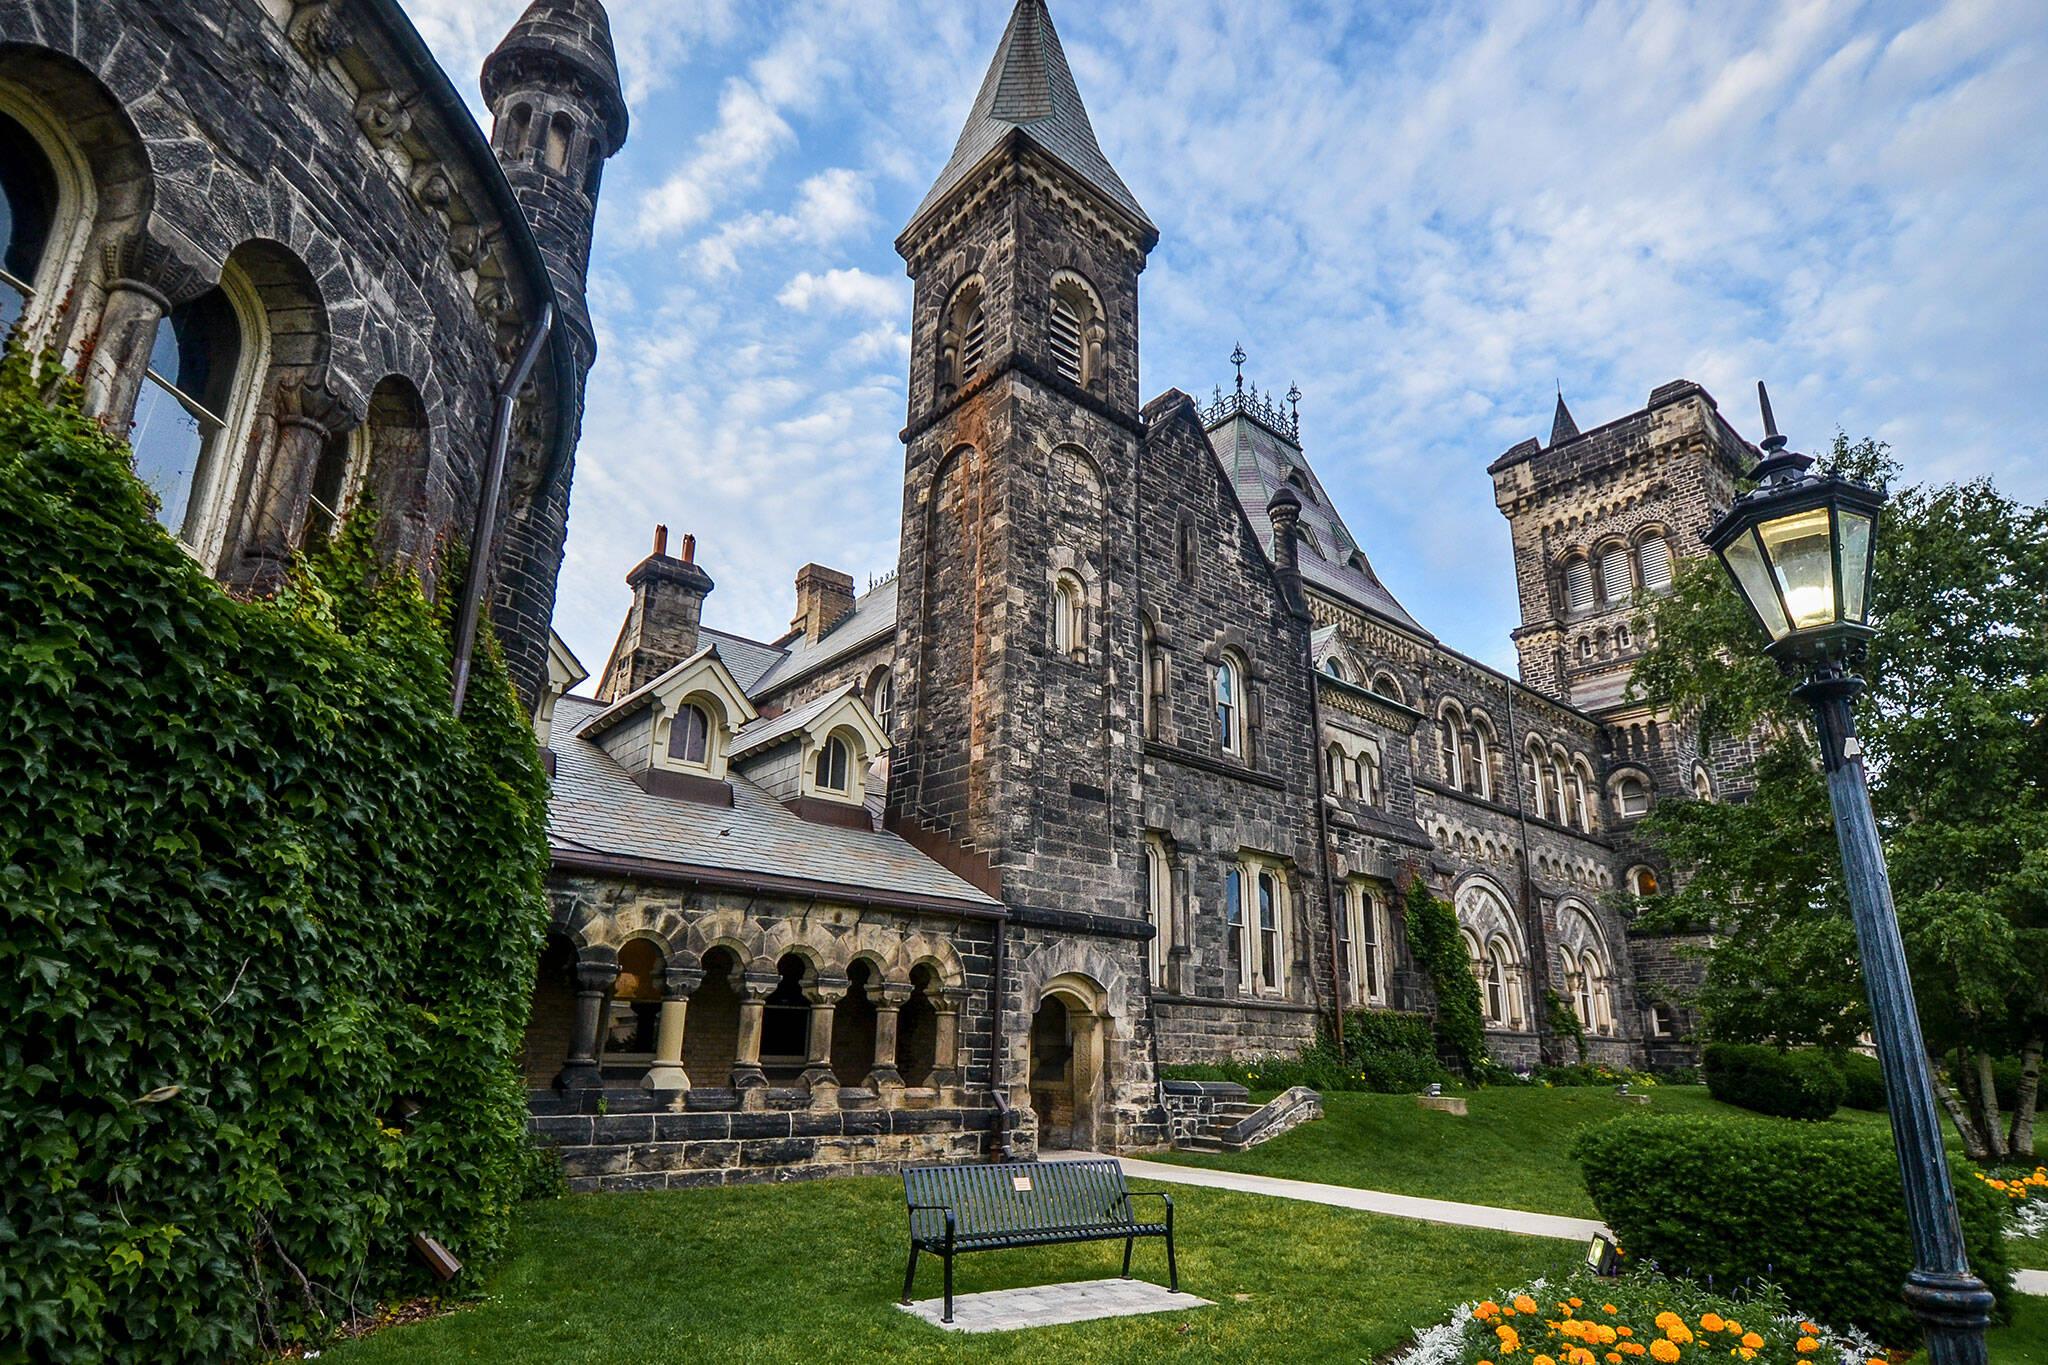 uoft best university in canada